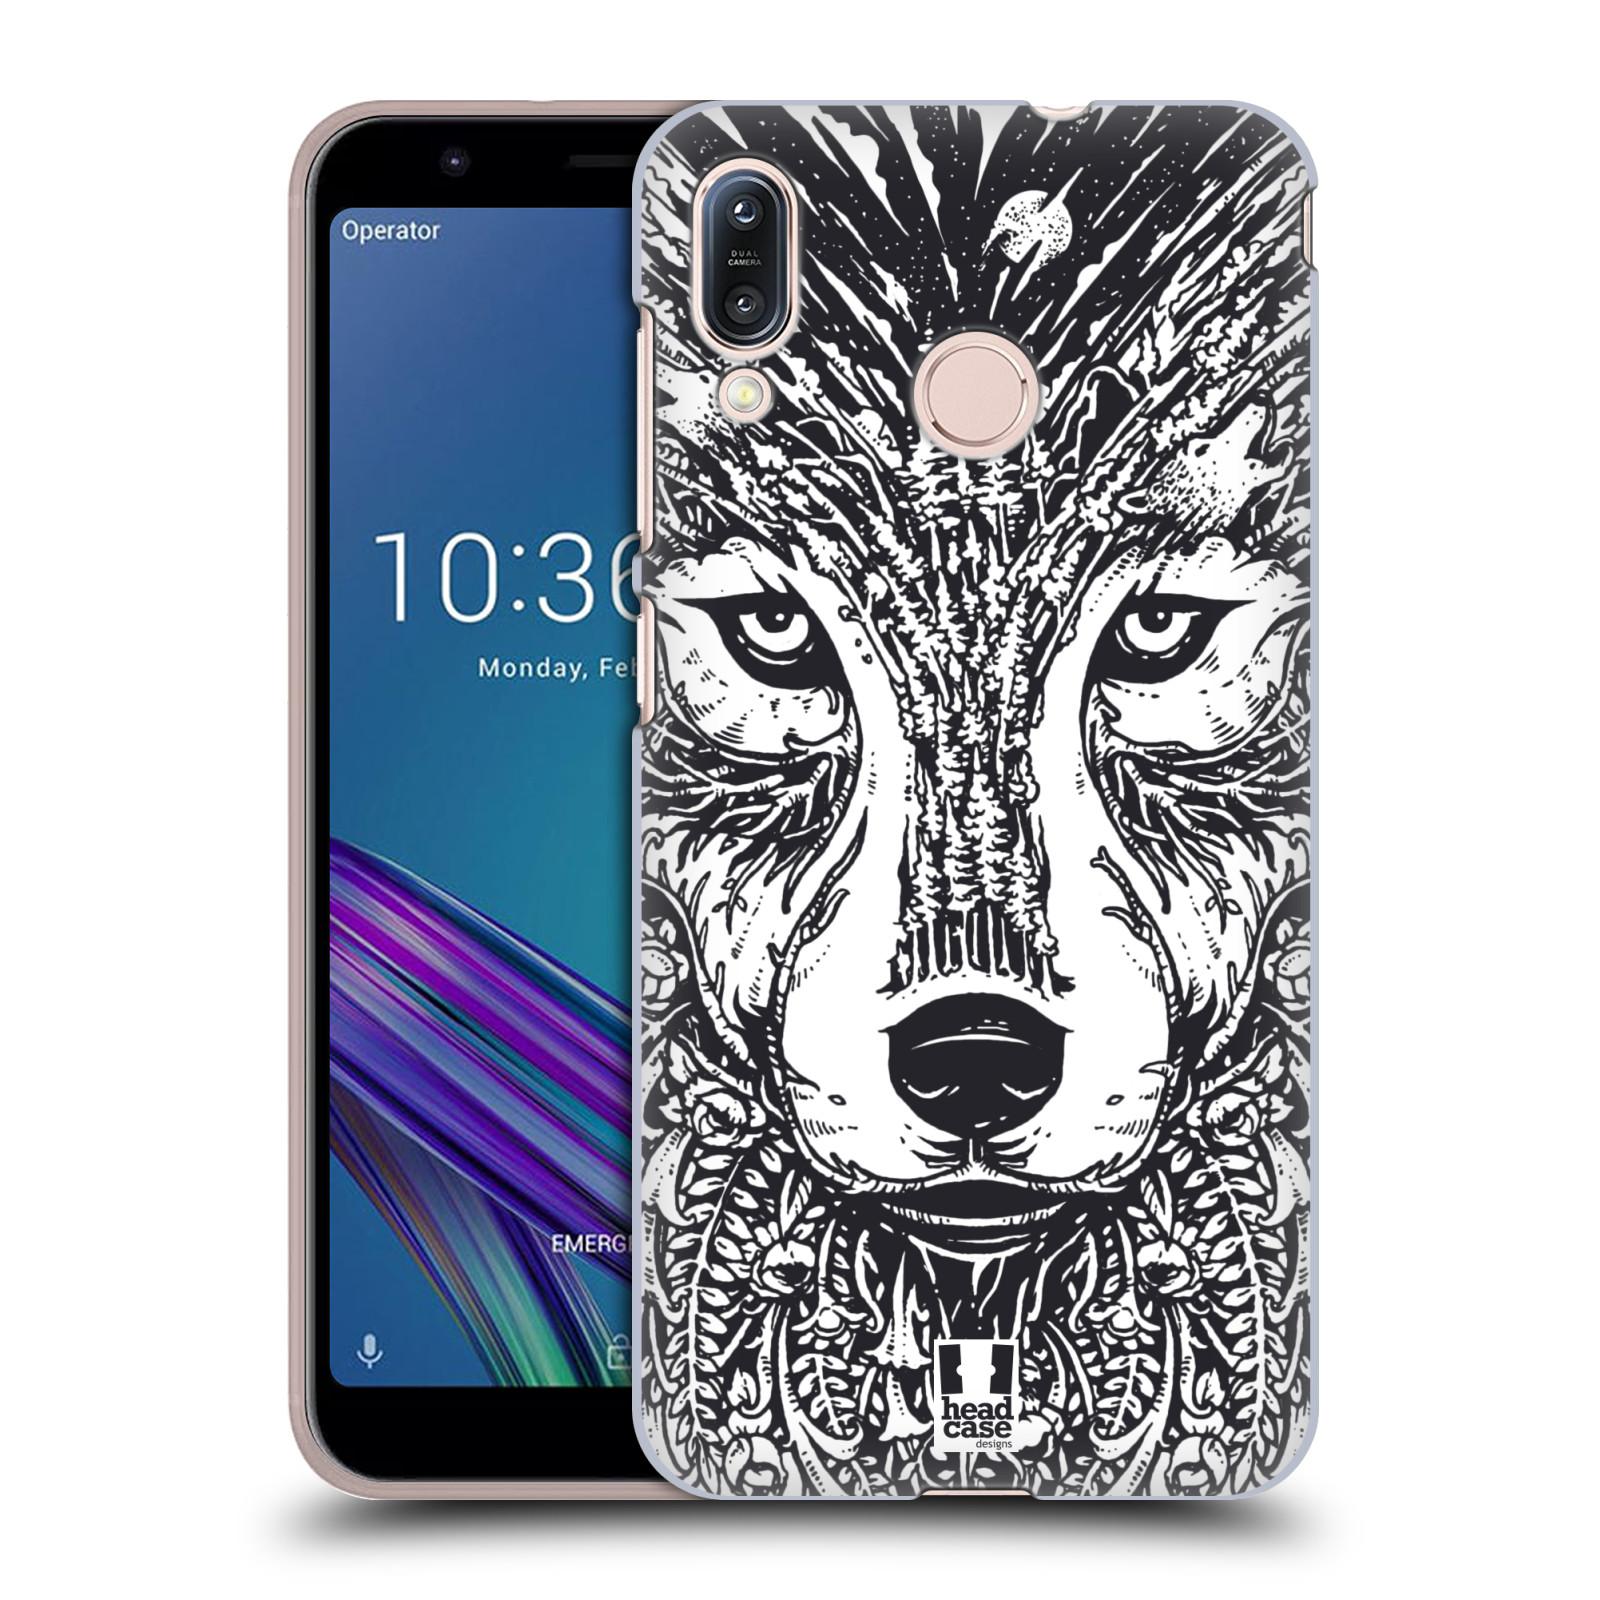 Plastové pouzdro na mobil Asus Zenfone Max M1 ZB555KL - Head Case - DOODLE TVÁŘ VLK